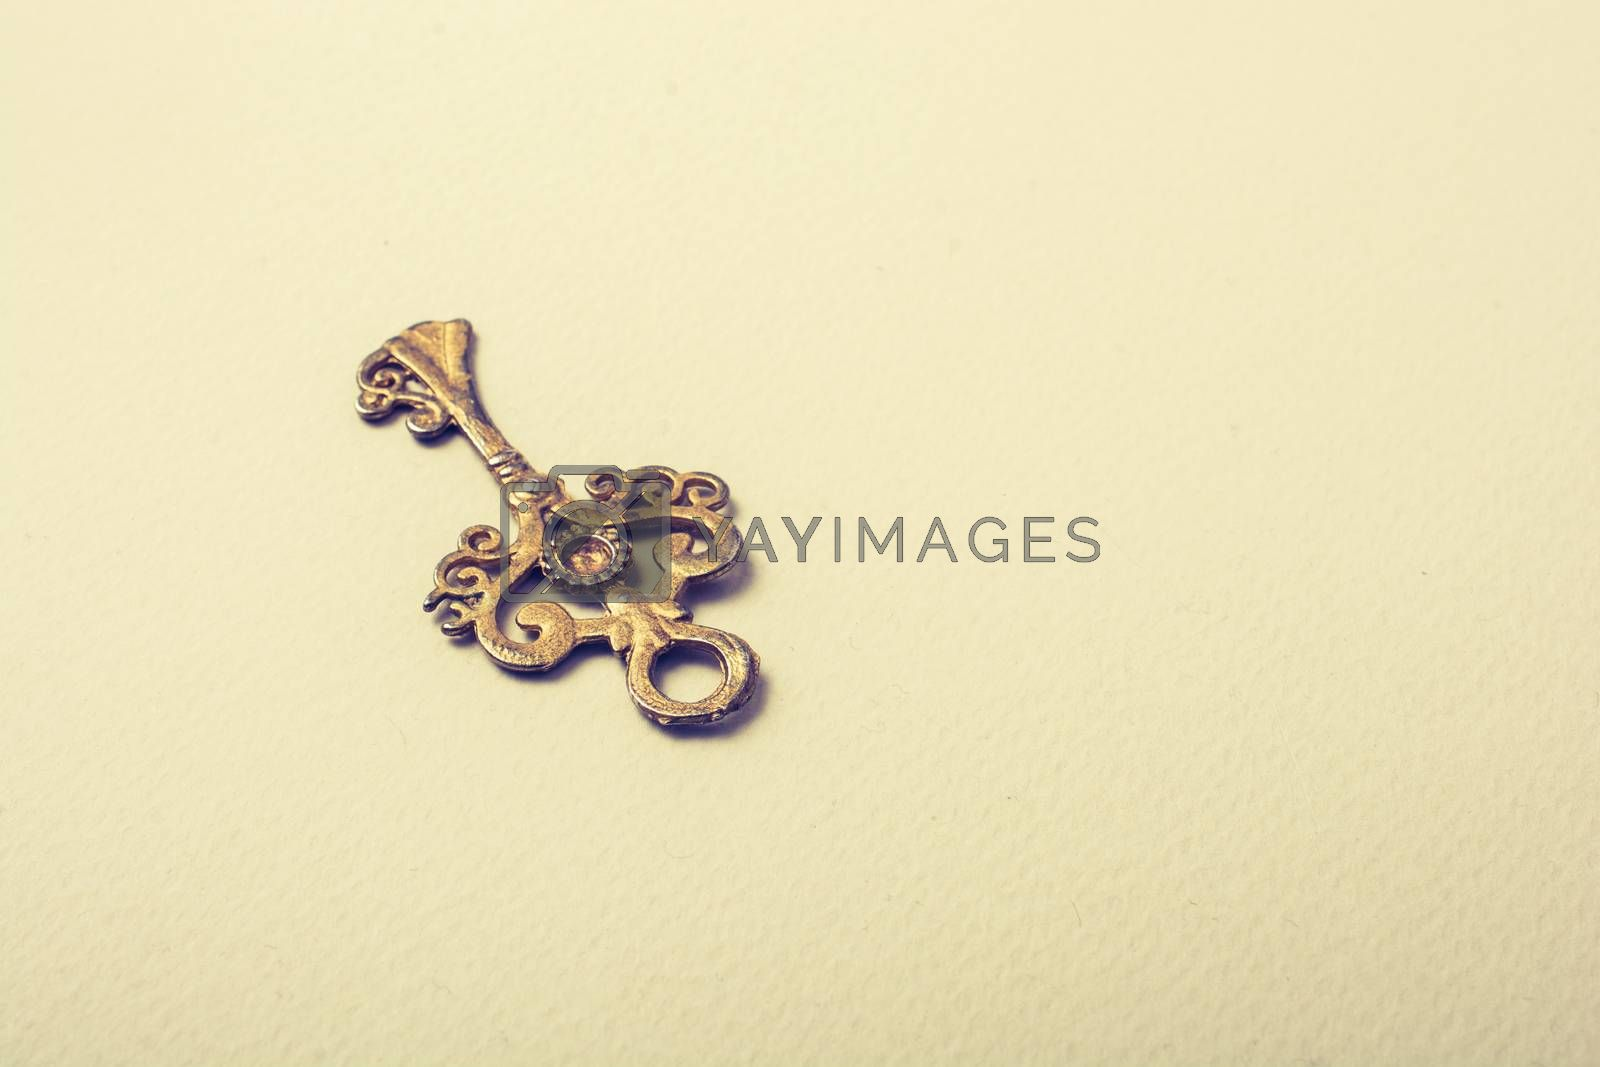 Retro style gold color key on white background